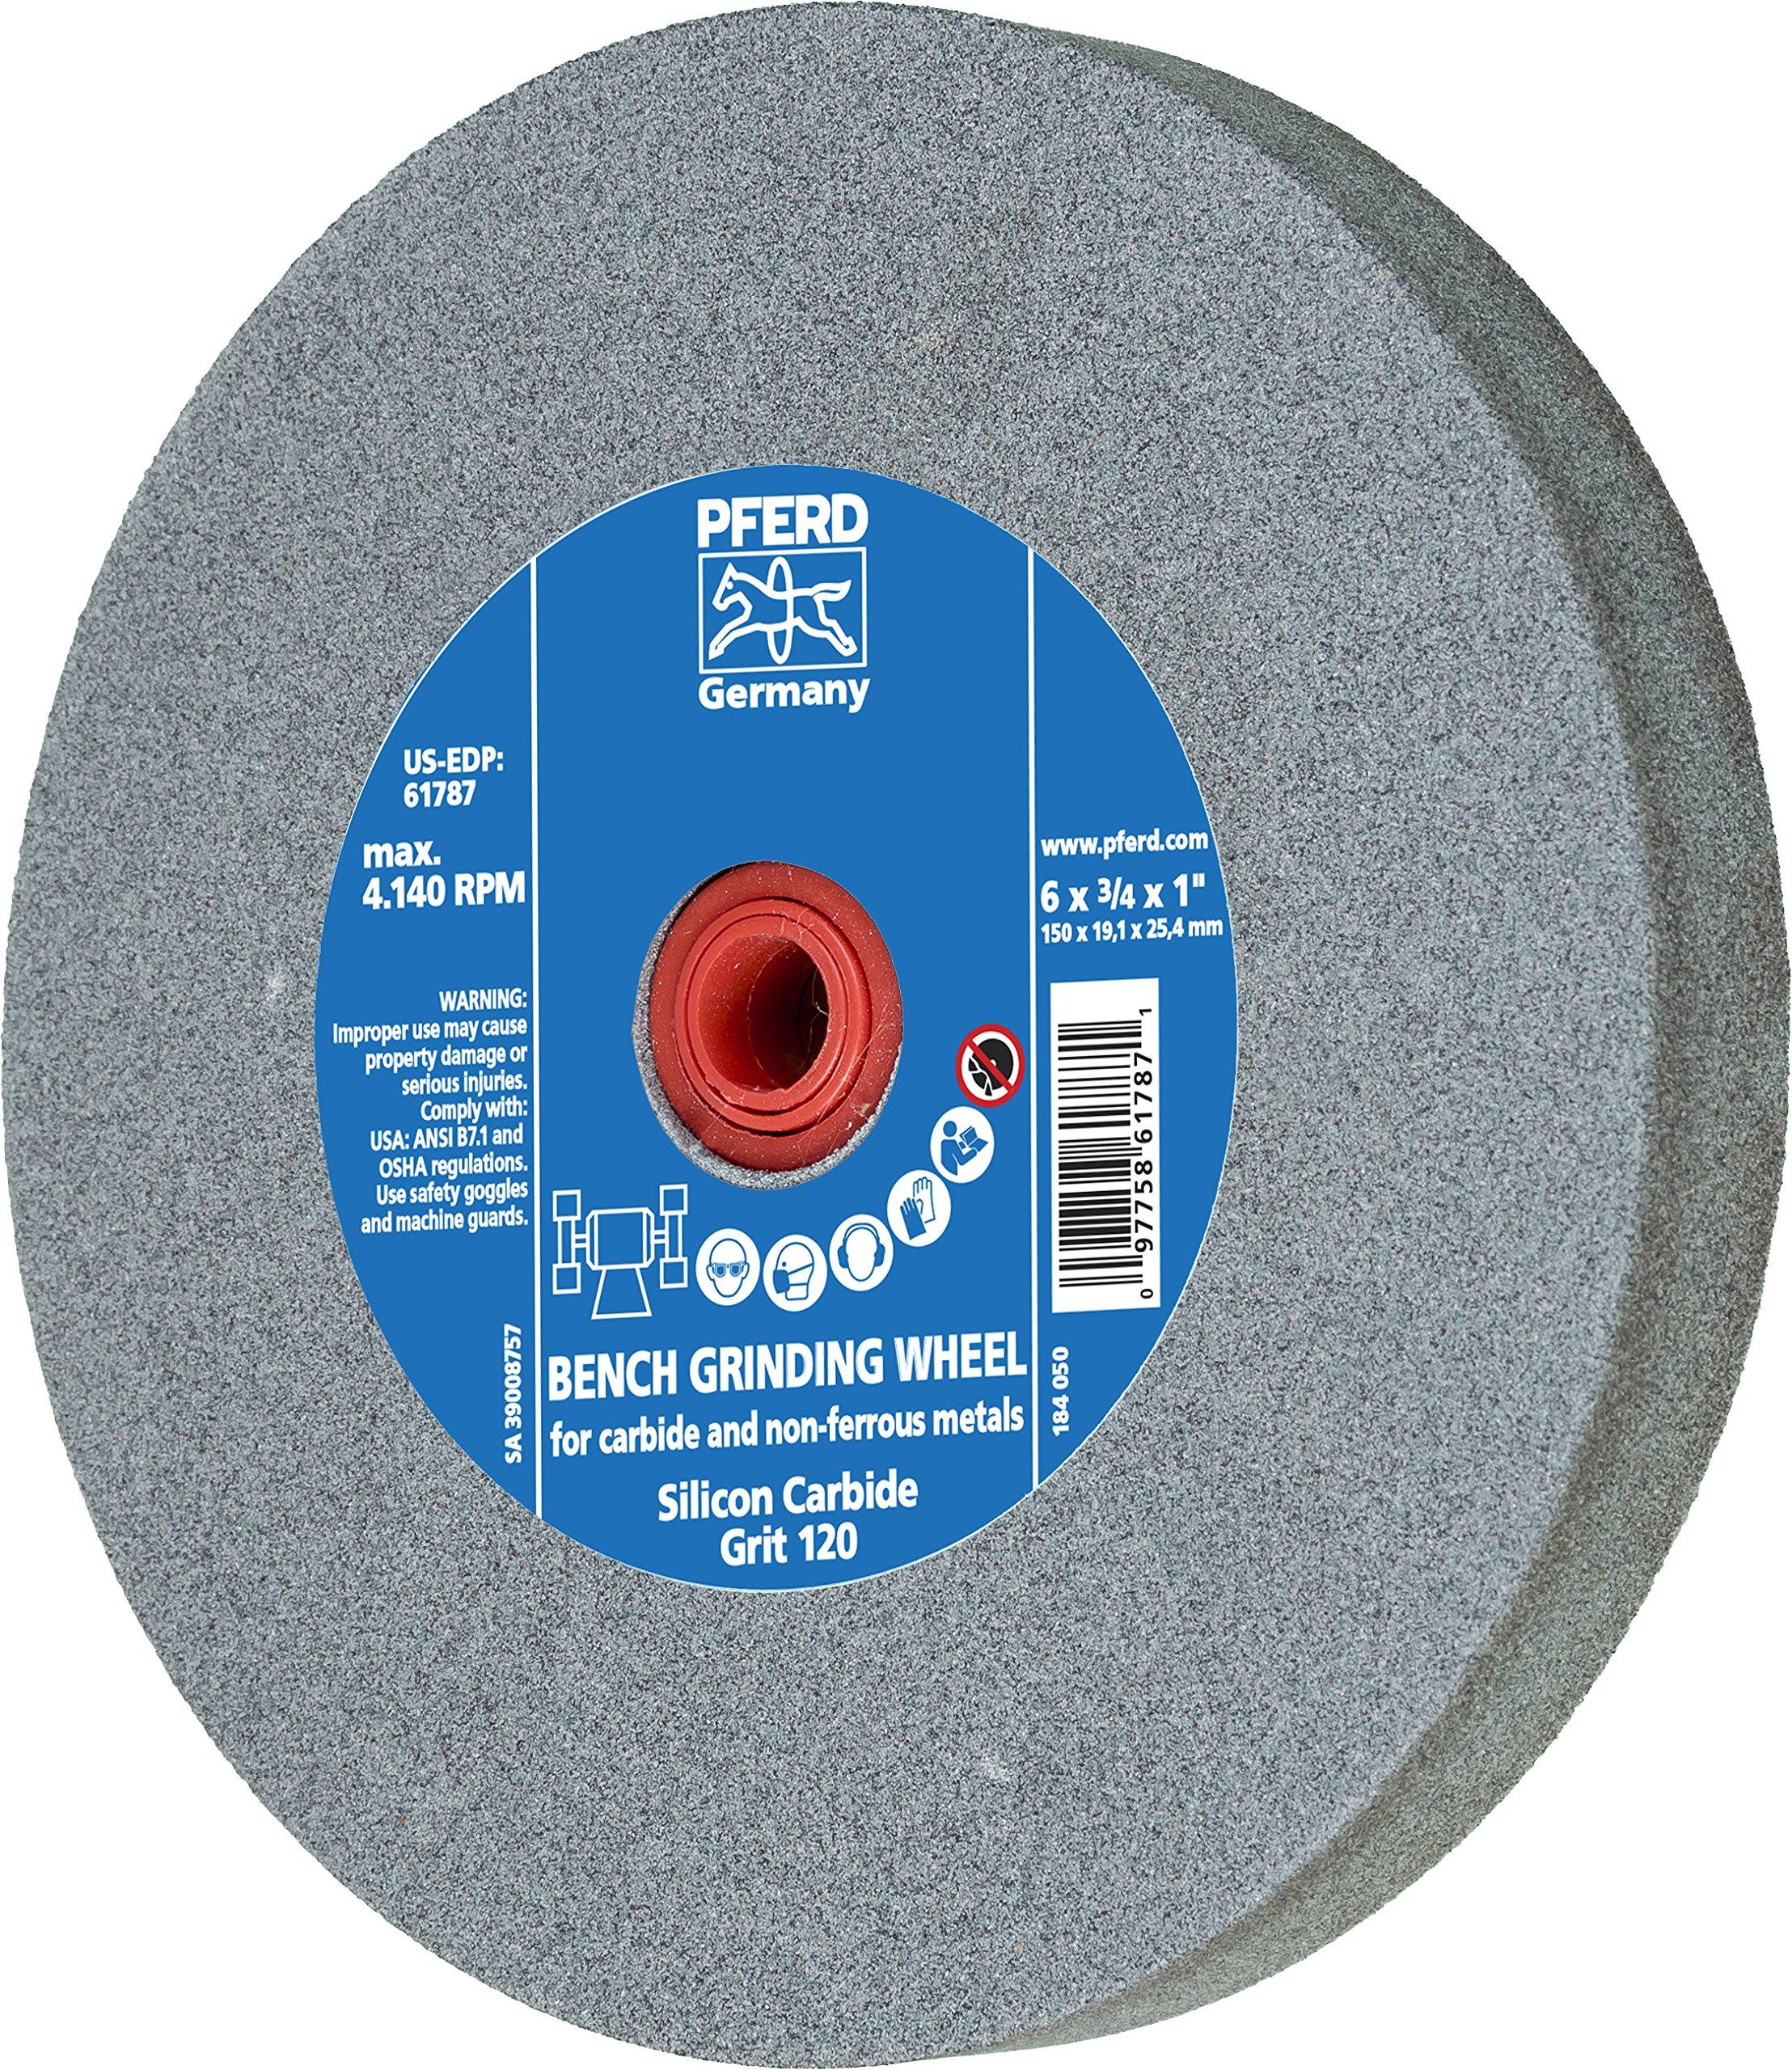 PFERD 61787 Bench Grinding Wheel, Silicon Carbide, 6'' Diameter, 3/4'' Thick, 1'' Arbor Hole, 120 Grit, 4140 Maximum RPM by Pferd